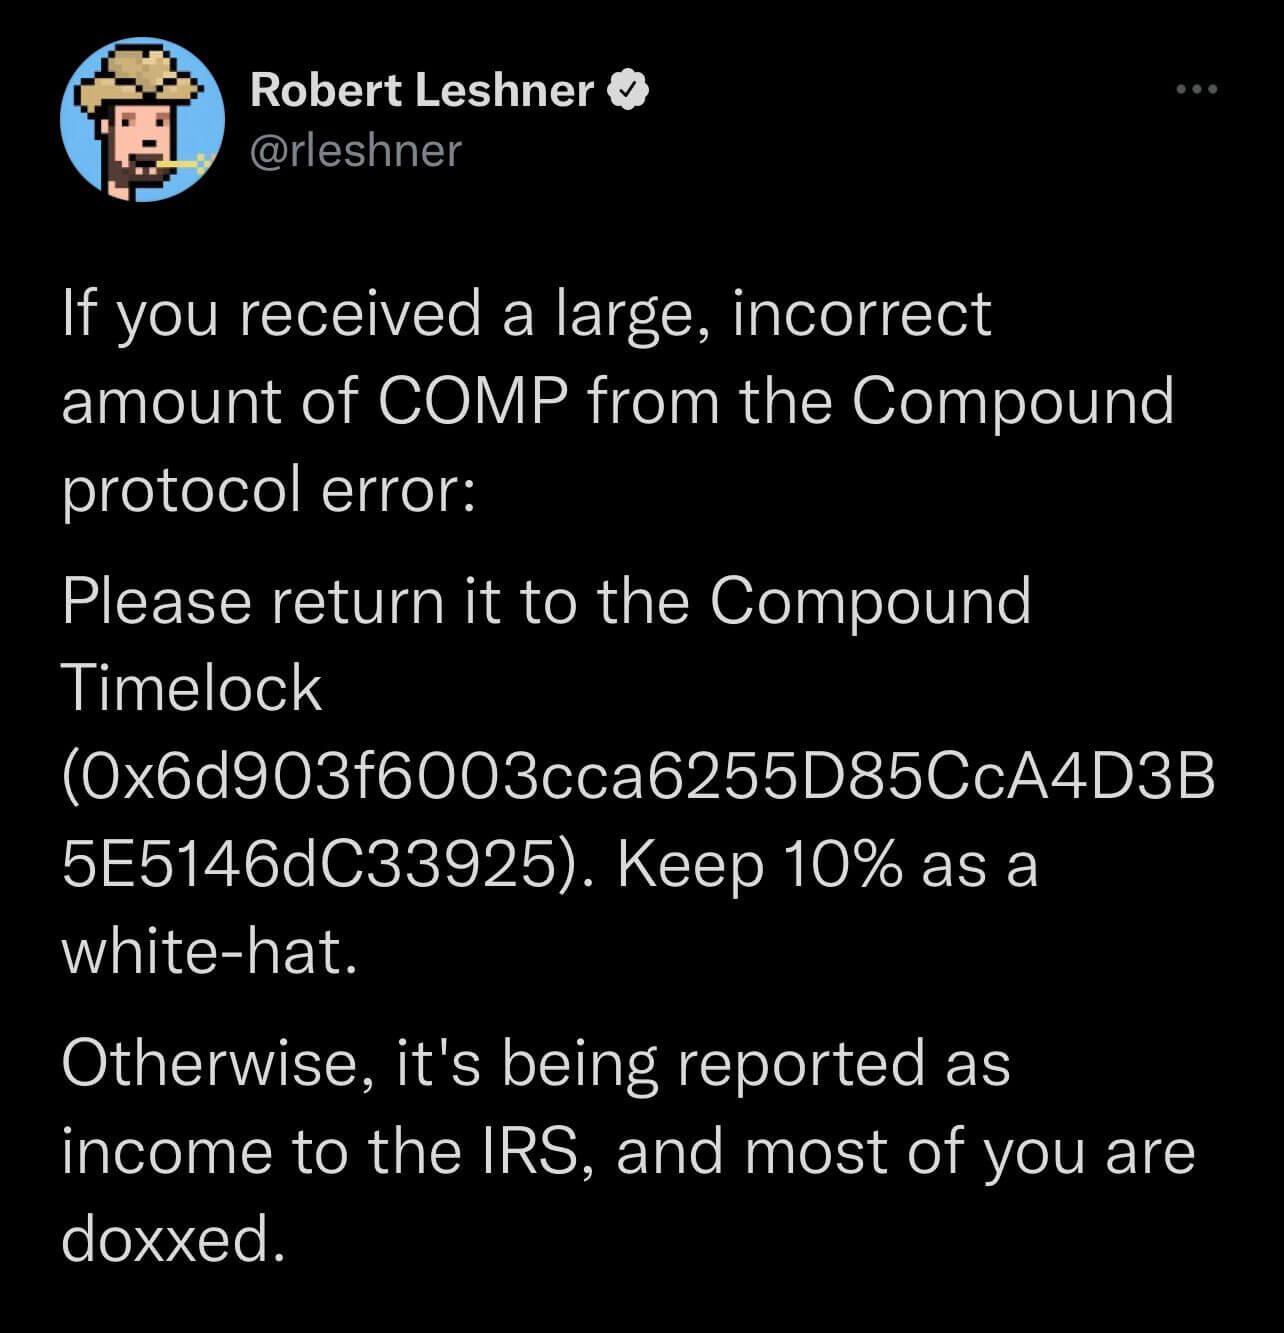 Роберт Лешнер Compound